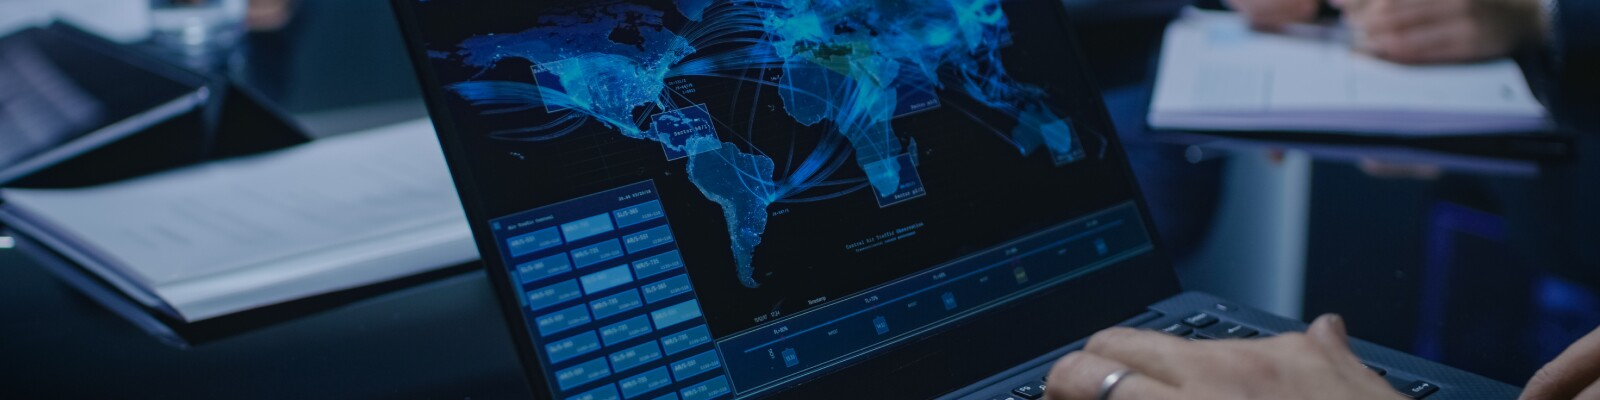 Digital graphs on a laptop